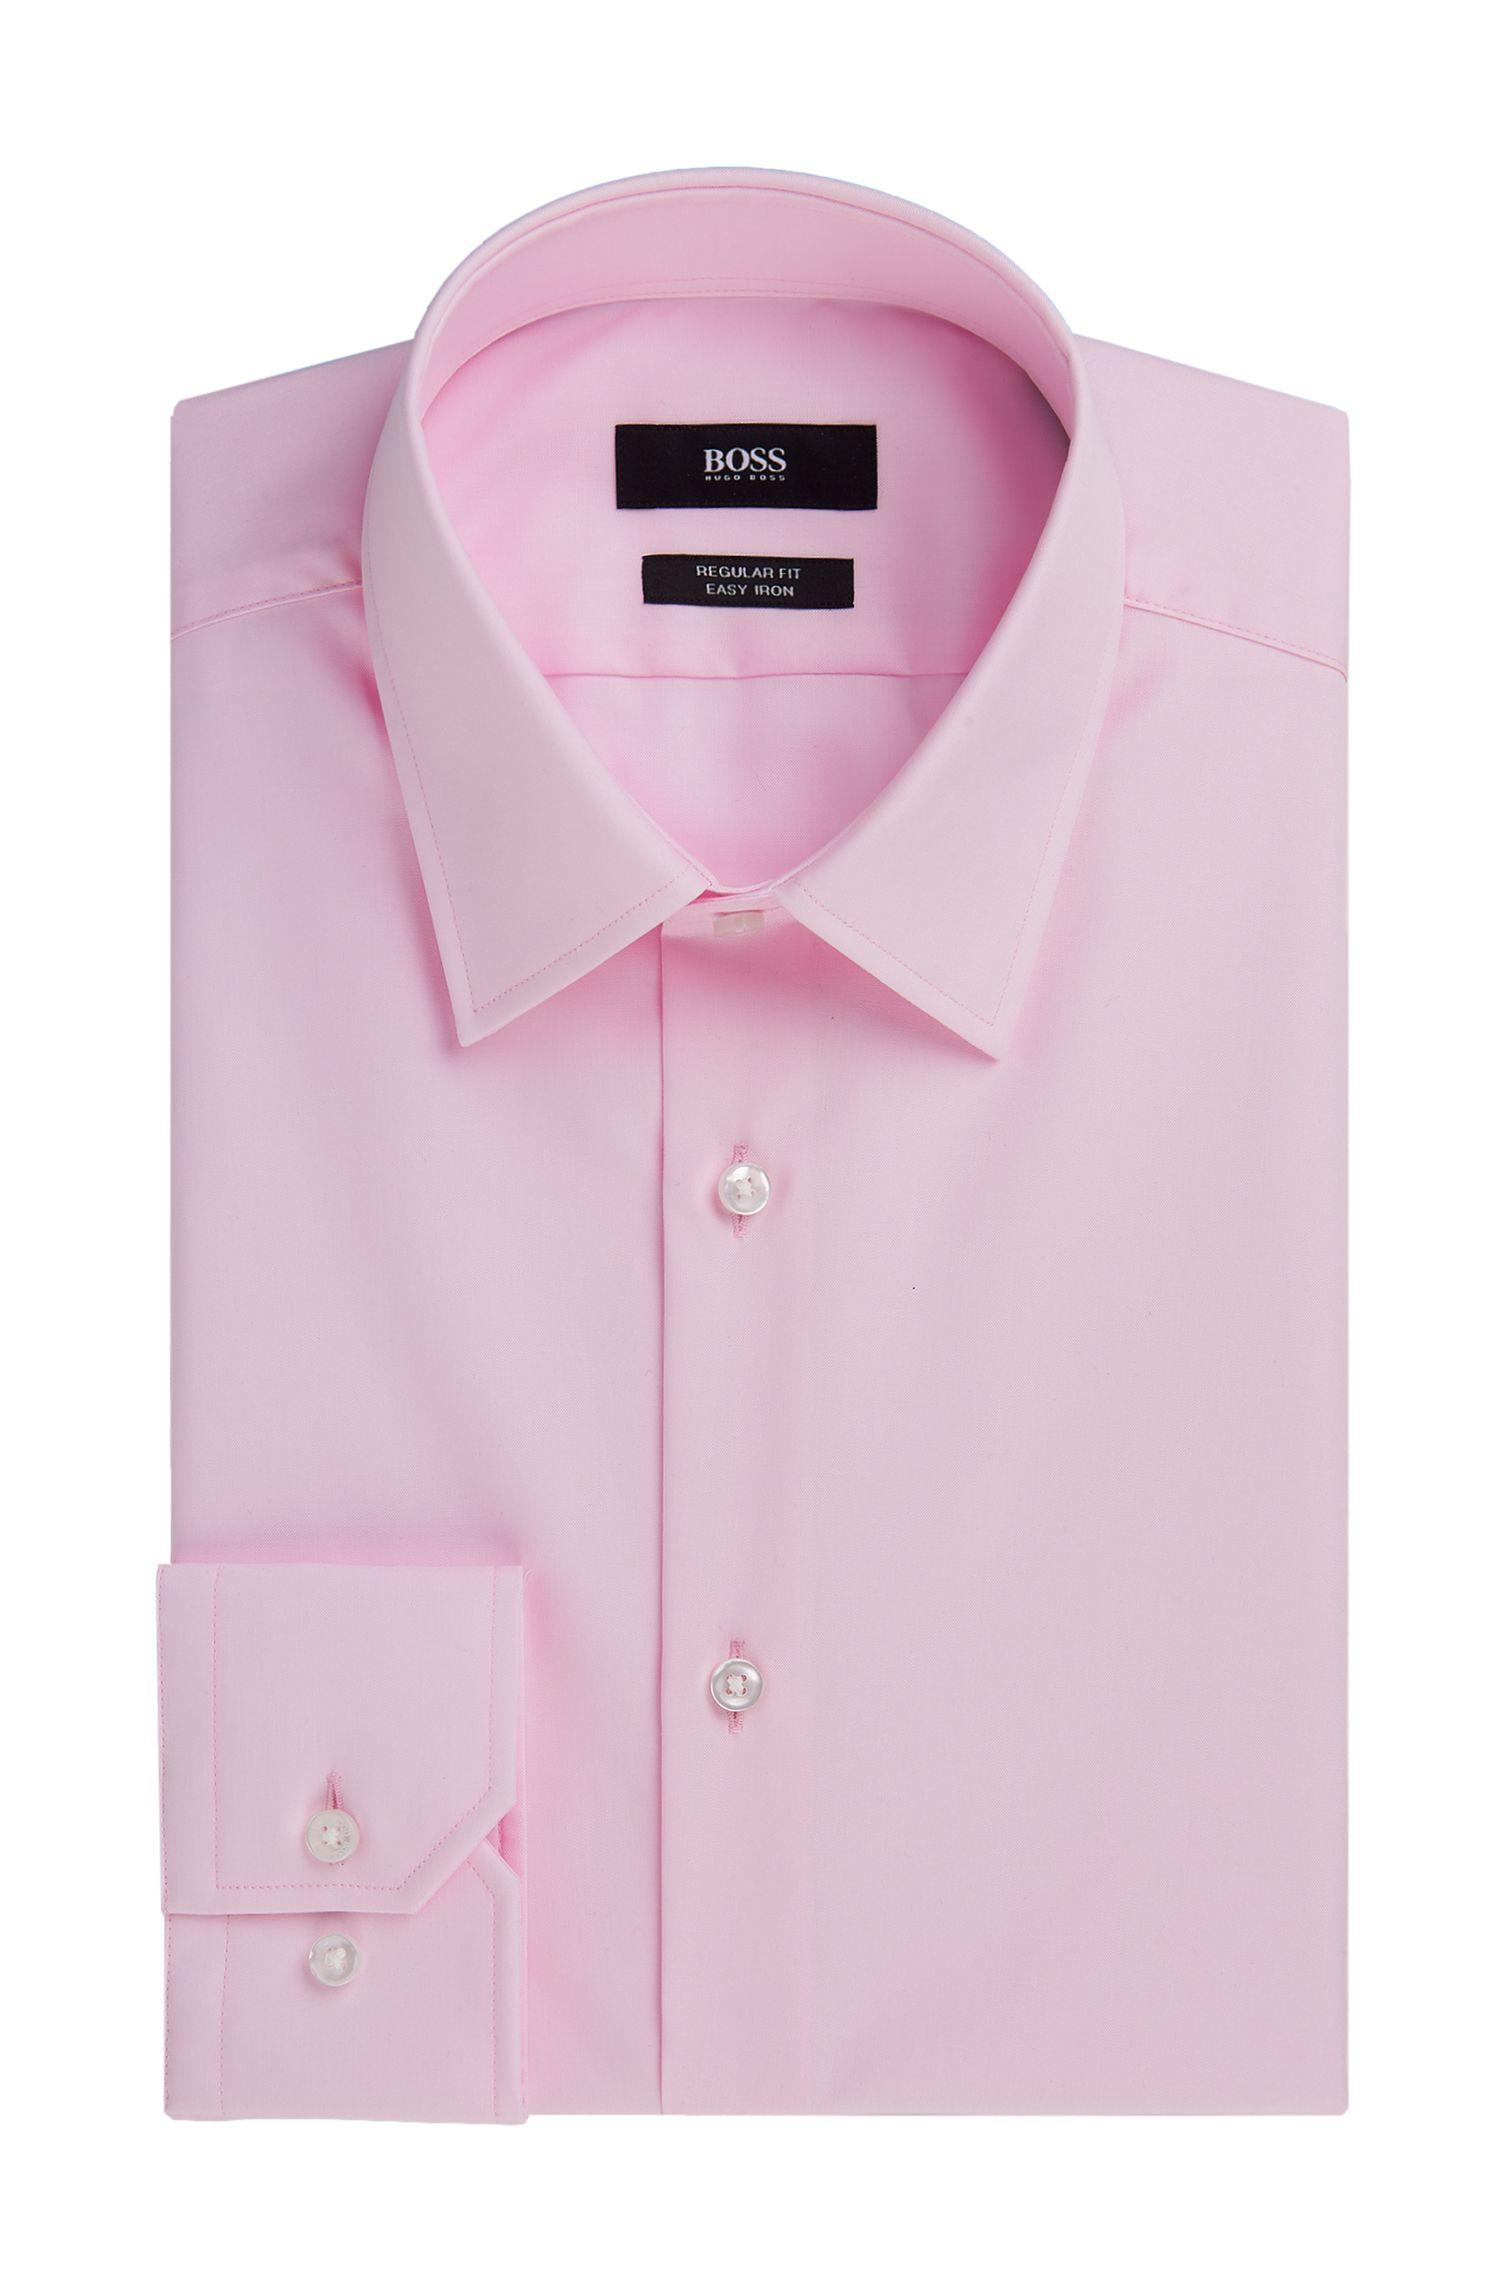 Regular Fit, Easy Iron Cotton Dress Shirt  | 'Enzo'